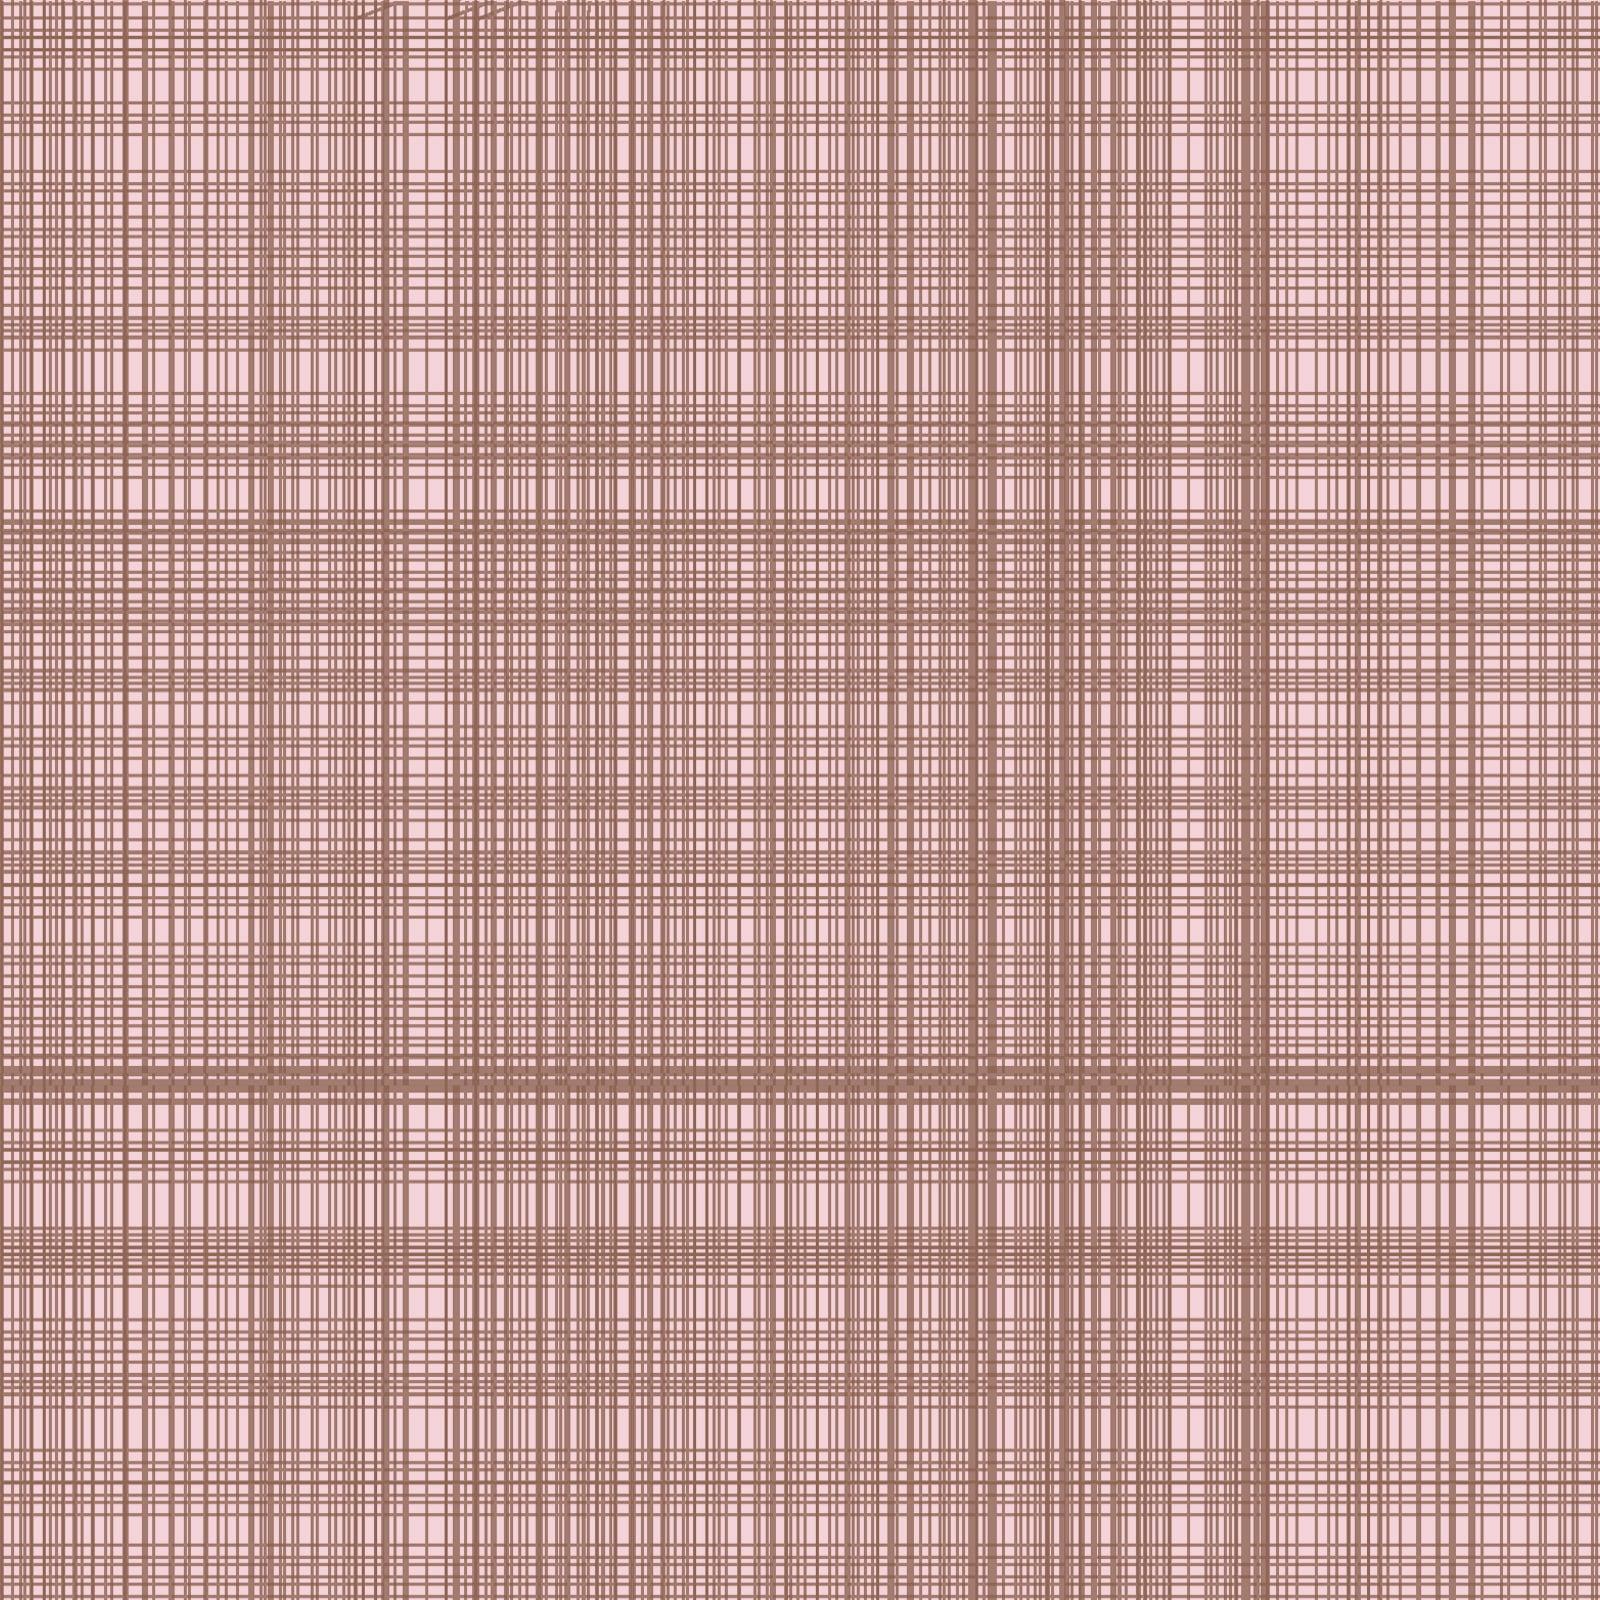 Tecido Tricoline Estampado Textura Rosa Seco 1292vr084